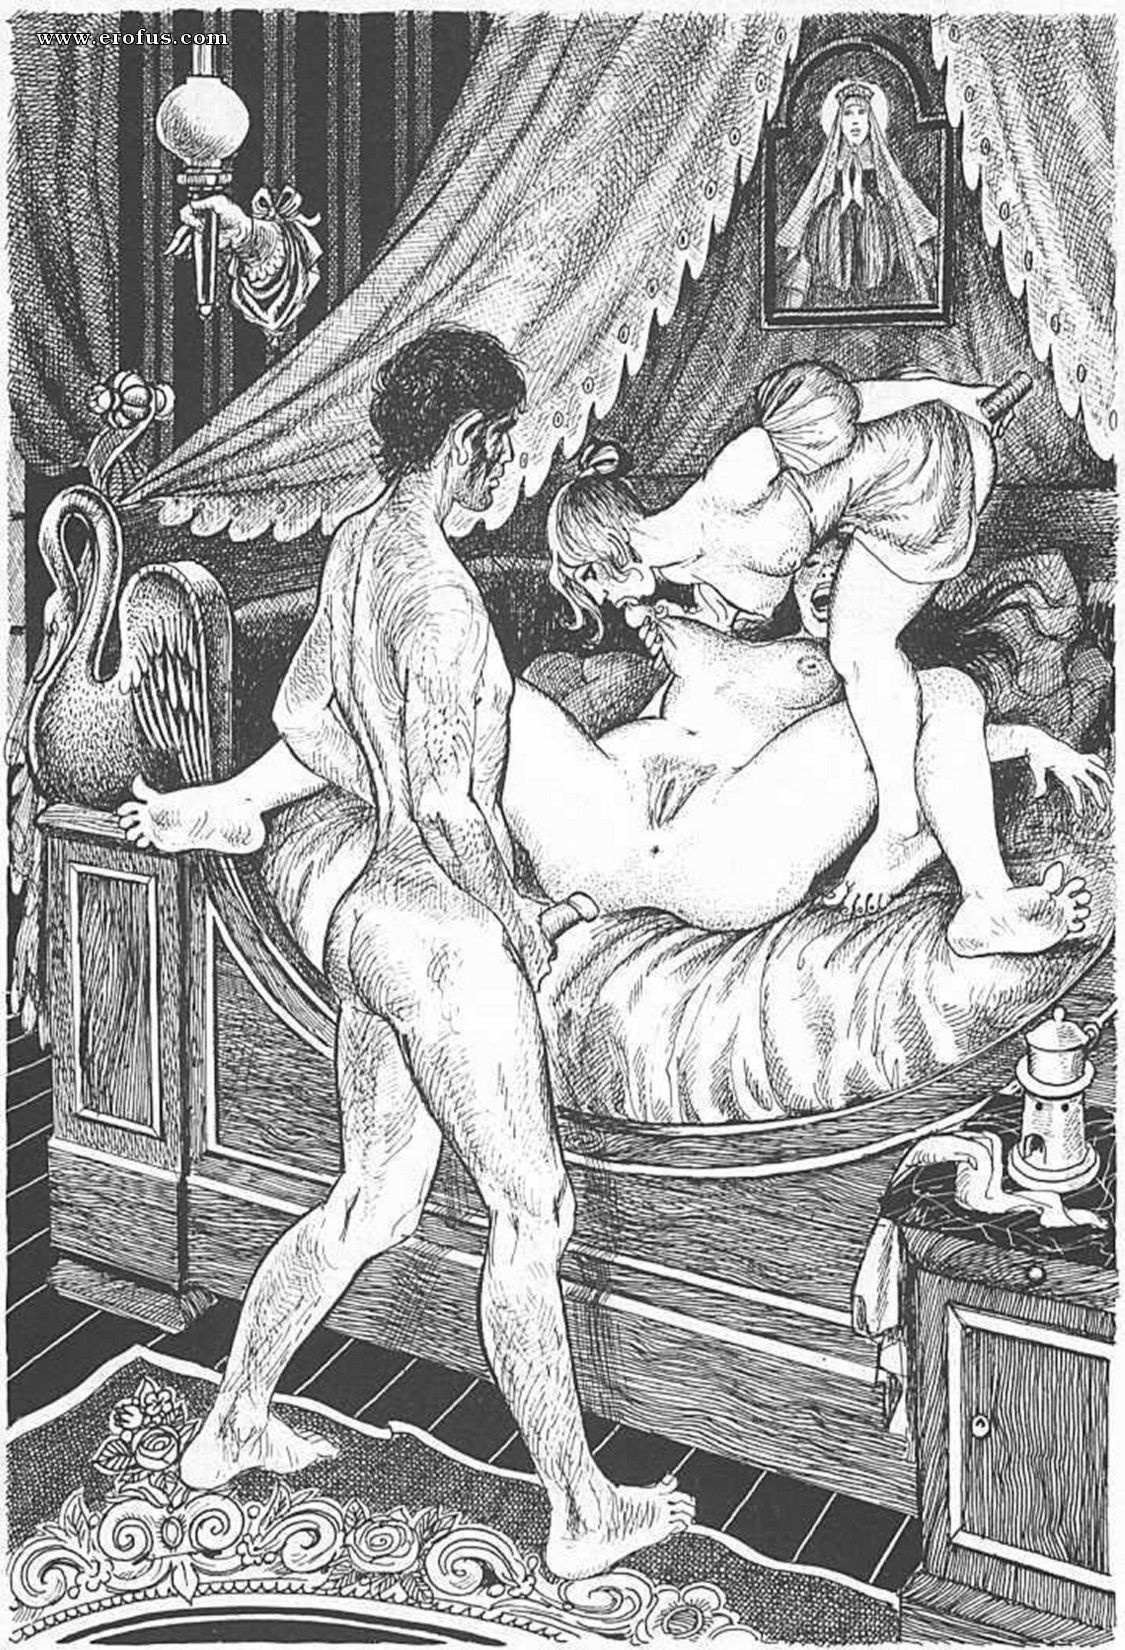 Sex, violence and self